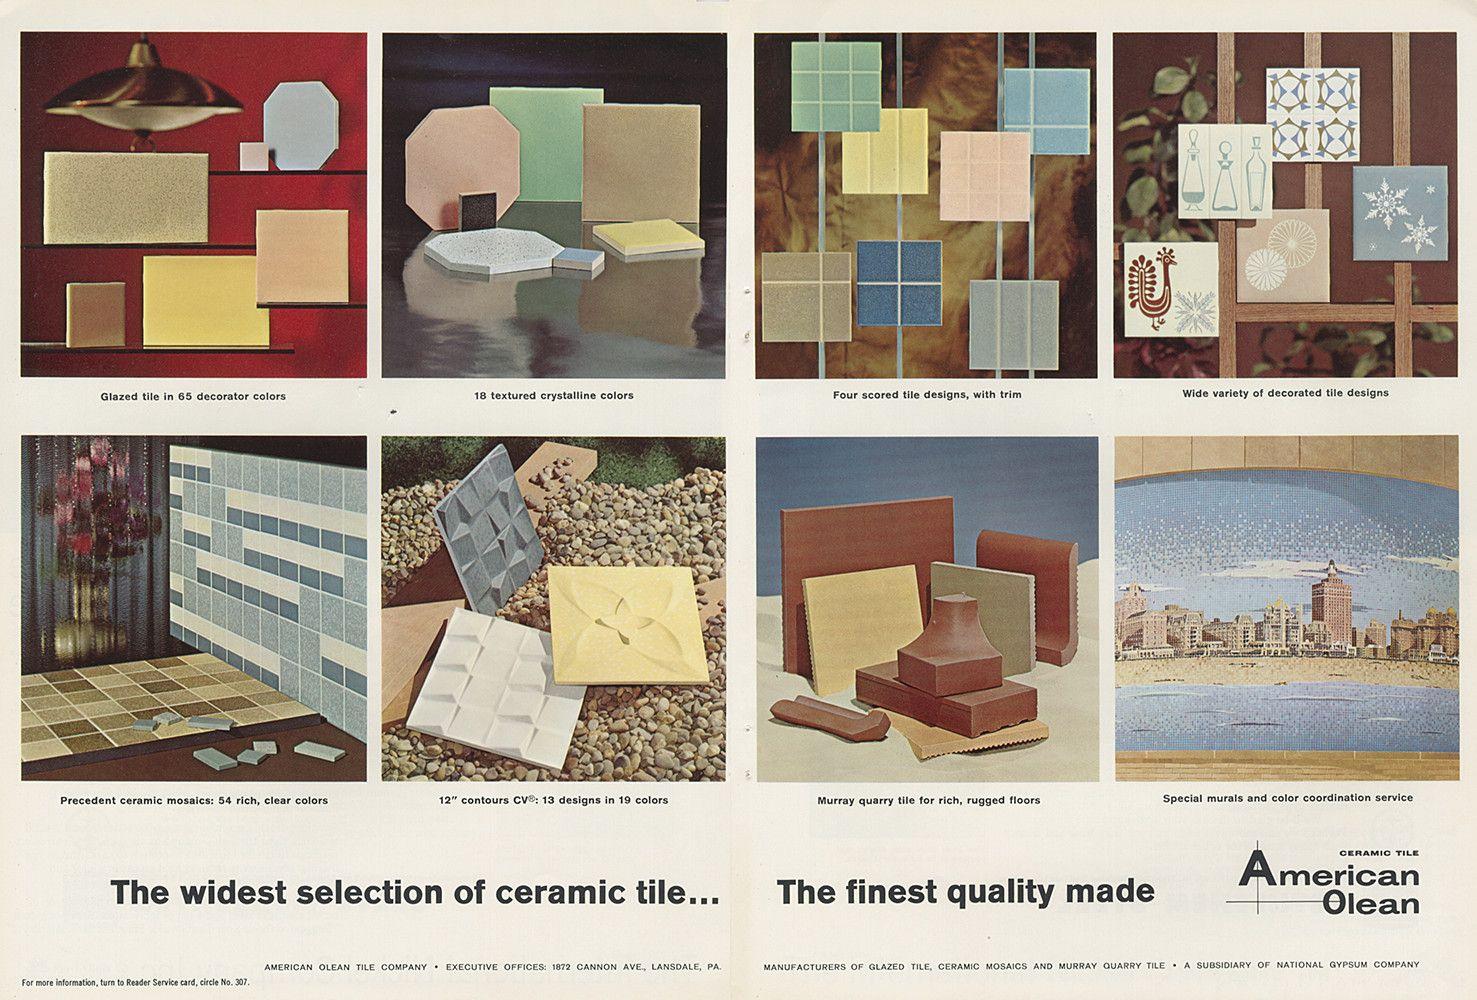 American olean ceramic tile home 03 pinterest vintage american olean ceramic tile dailygadgetfo Choice Image